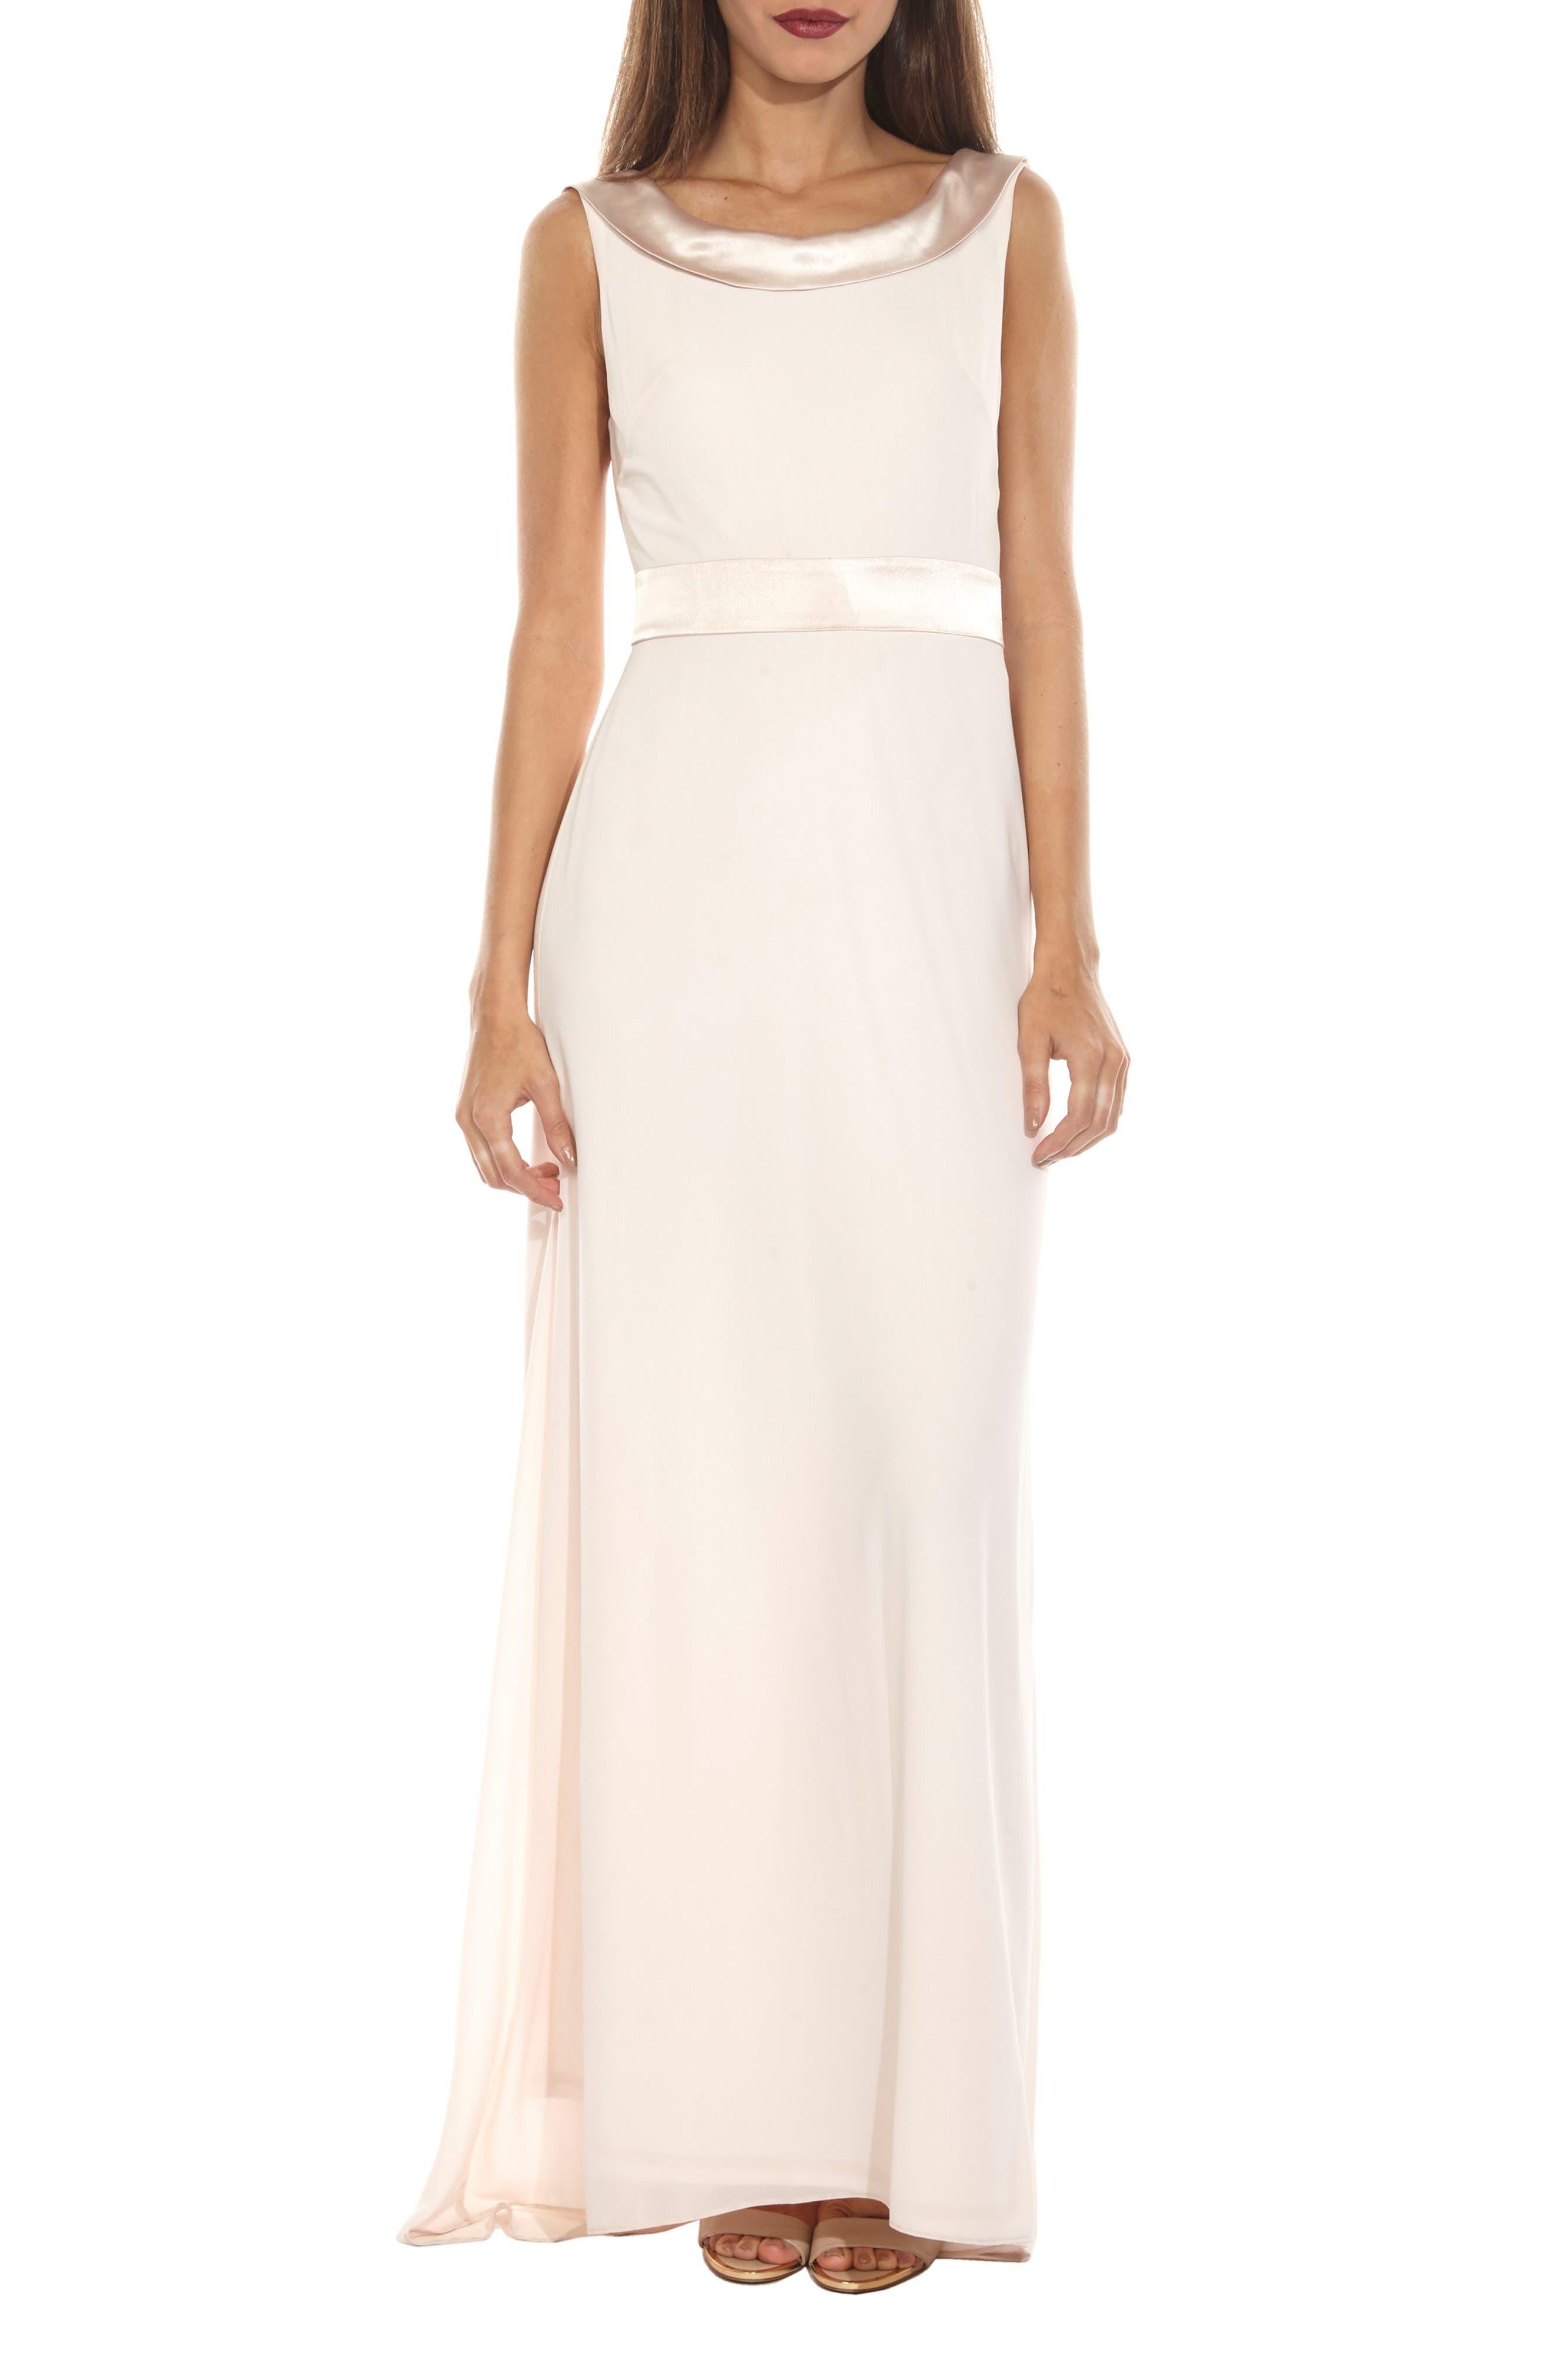 Daralls V-Back Maxi Dress,                             Main thumbnail 1, color,                             280